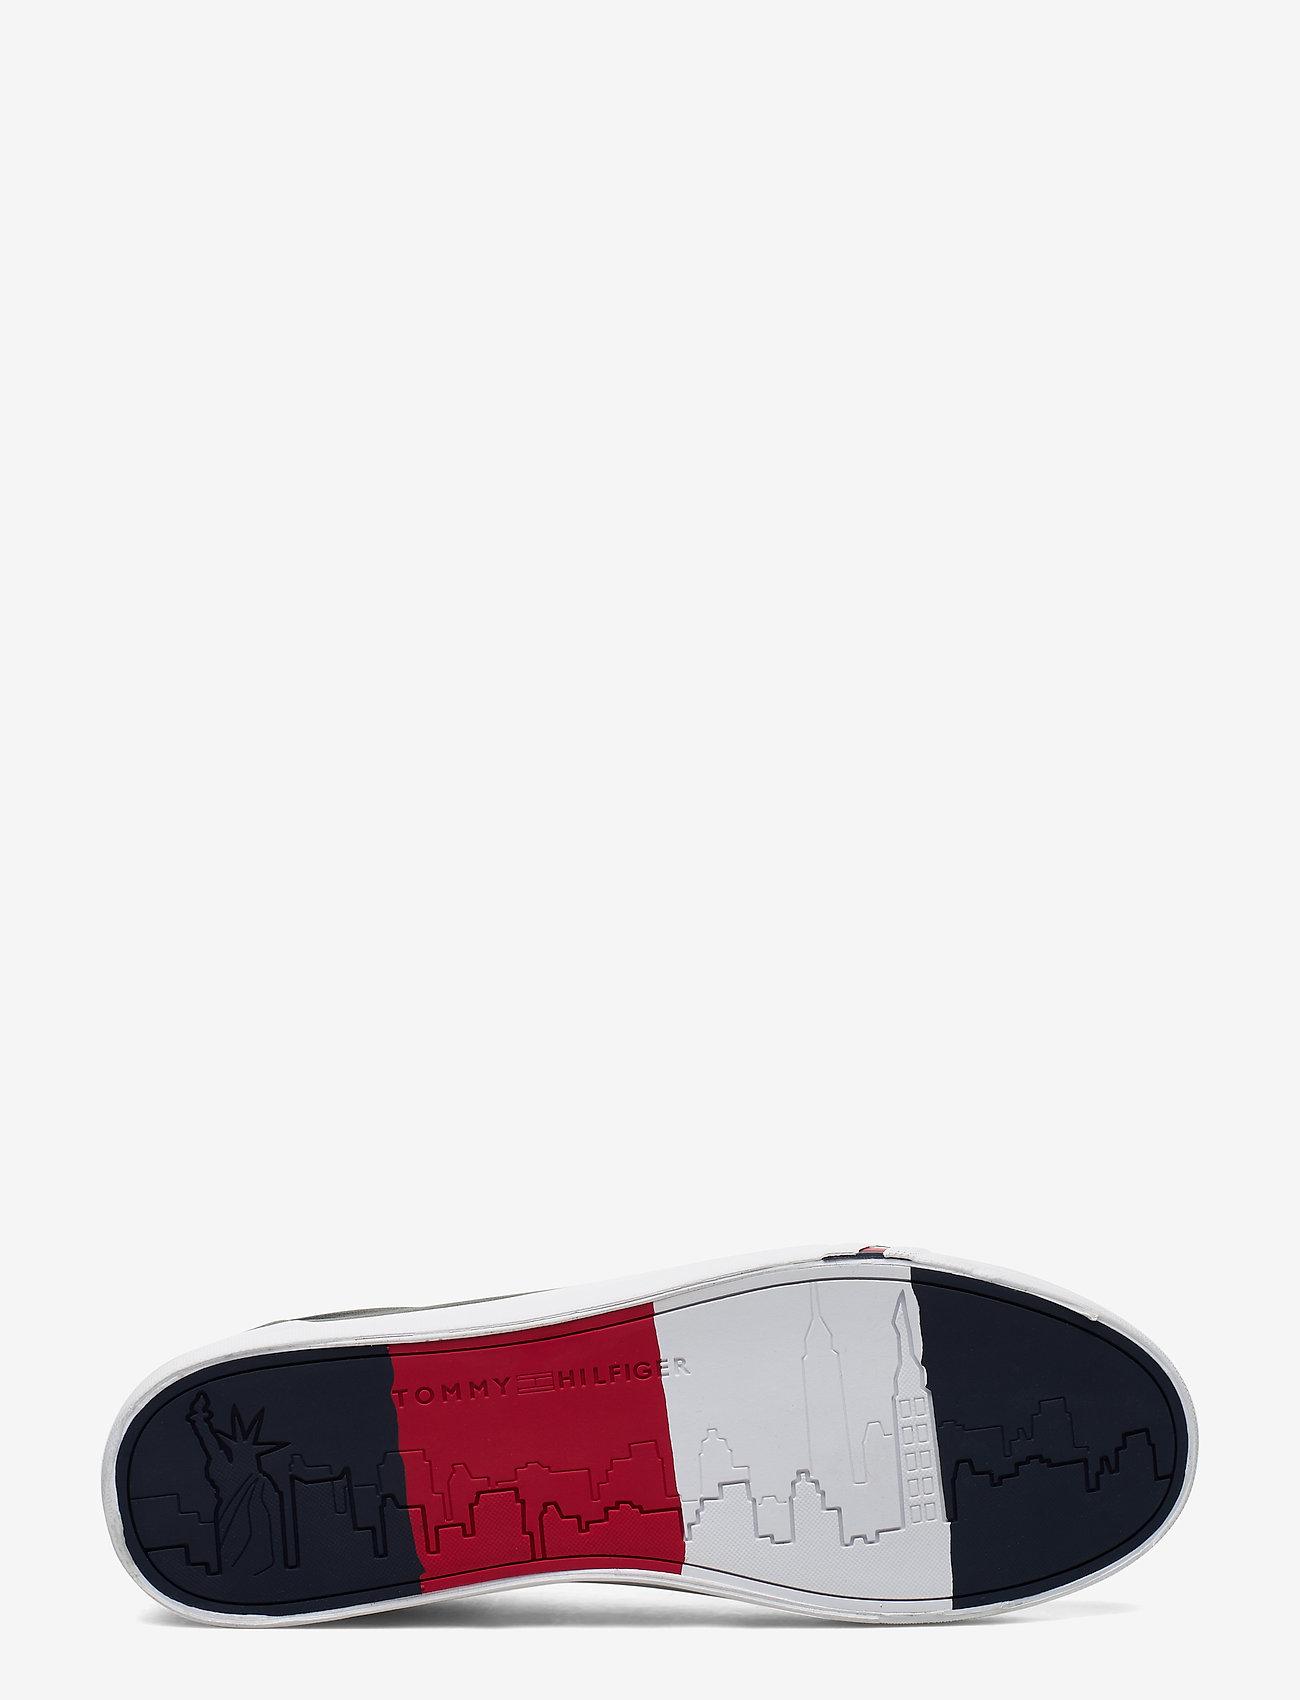 Corporate Leather Sneaker (Desert Sky) - Tommy Hilfiger